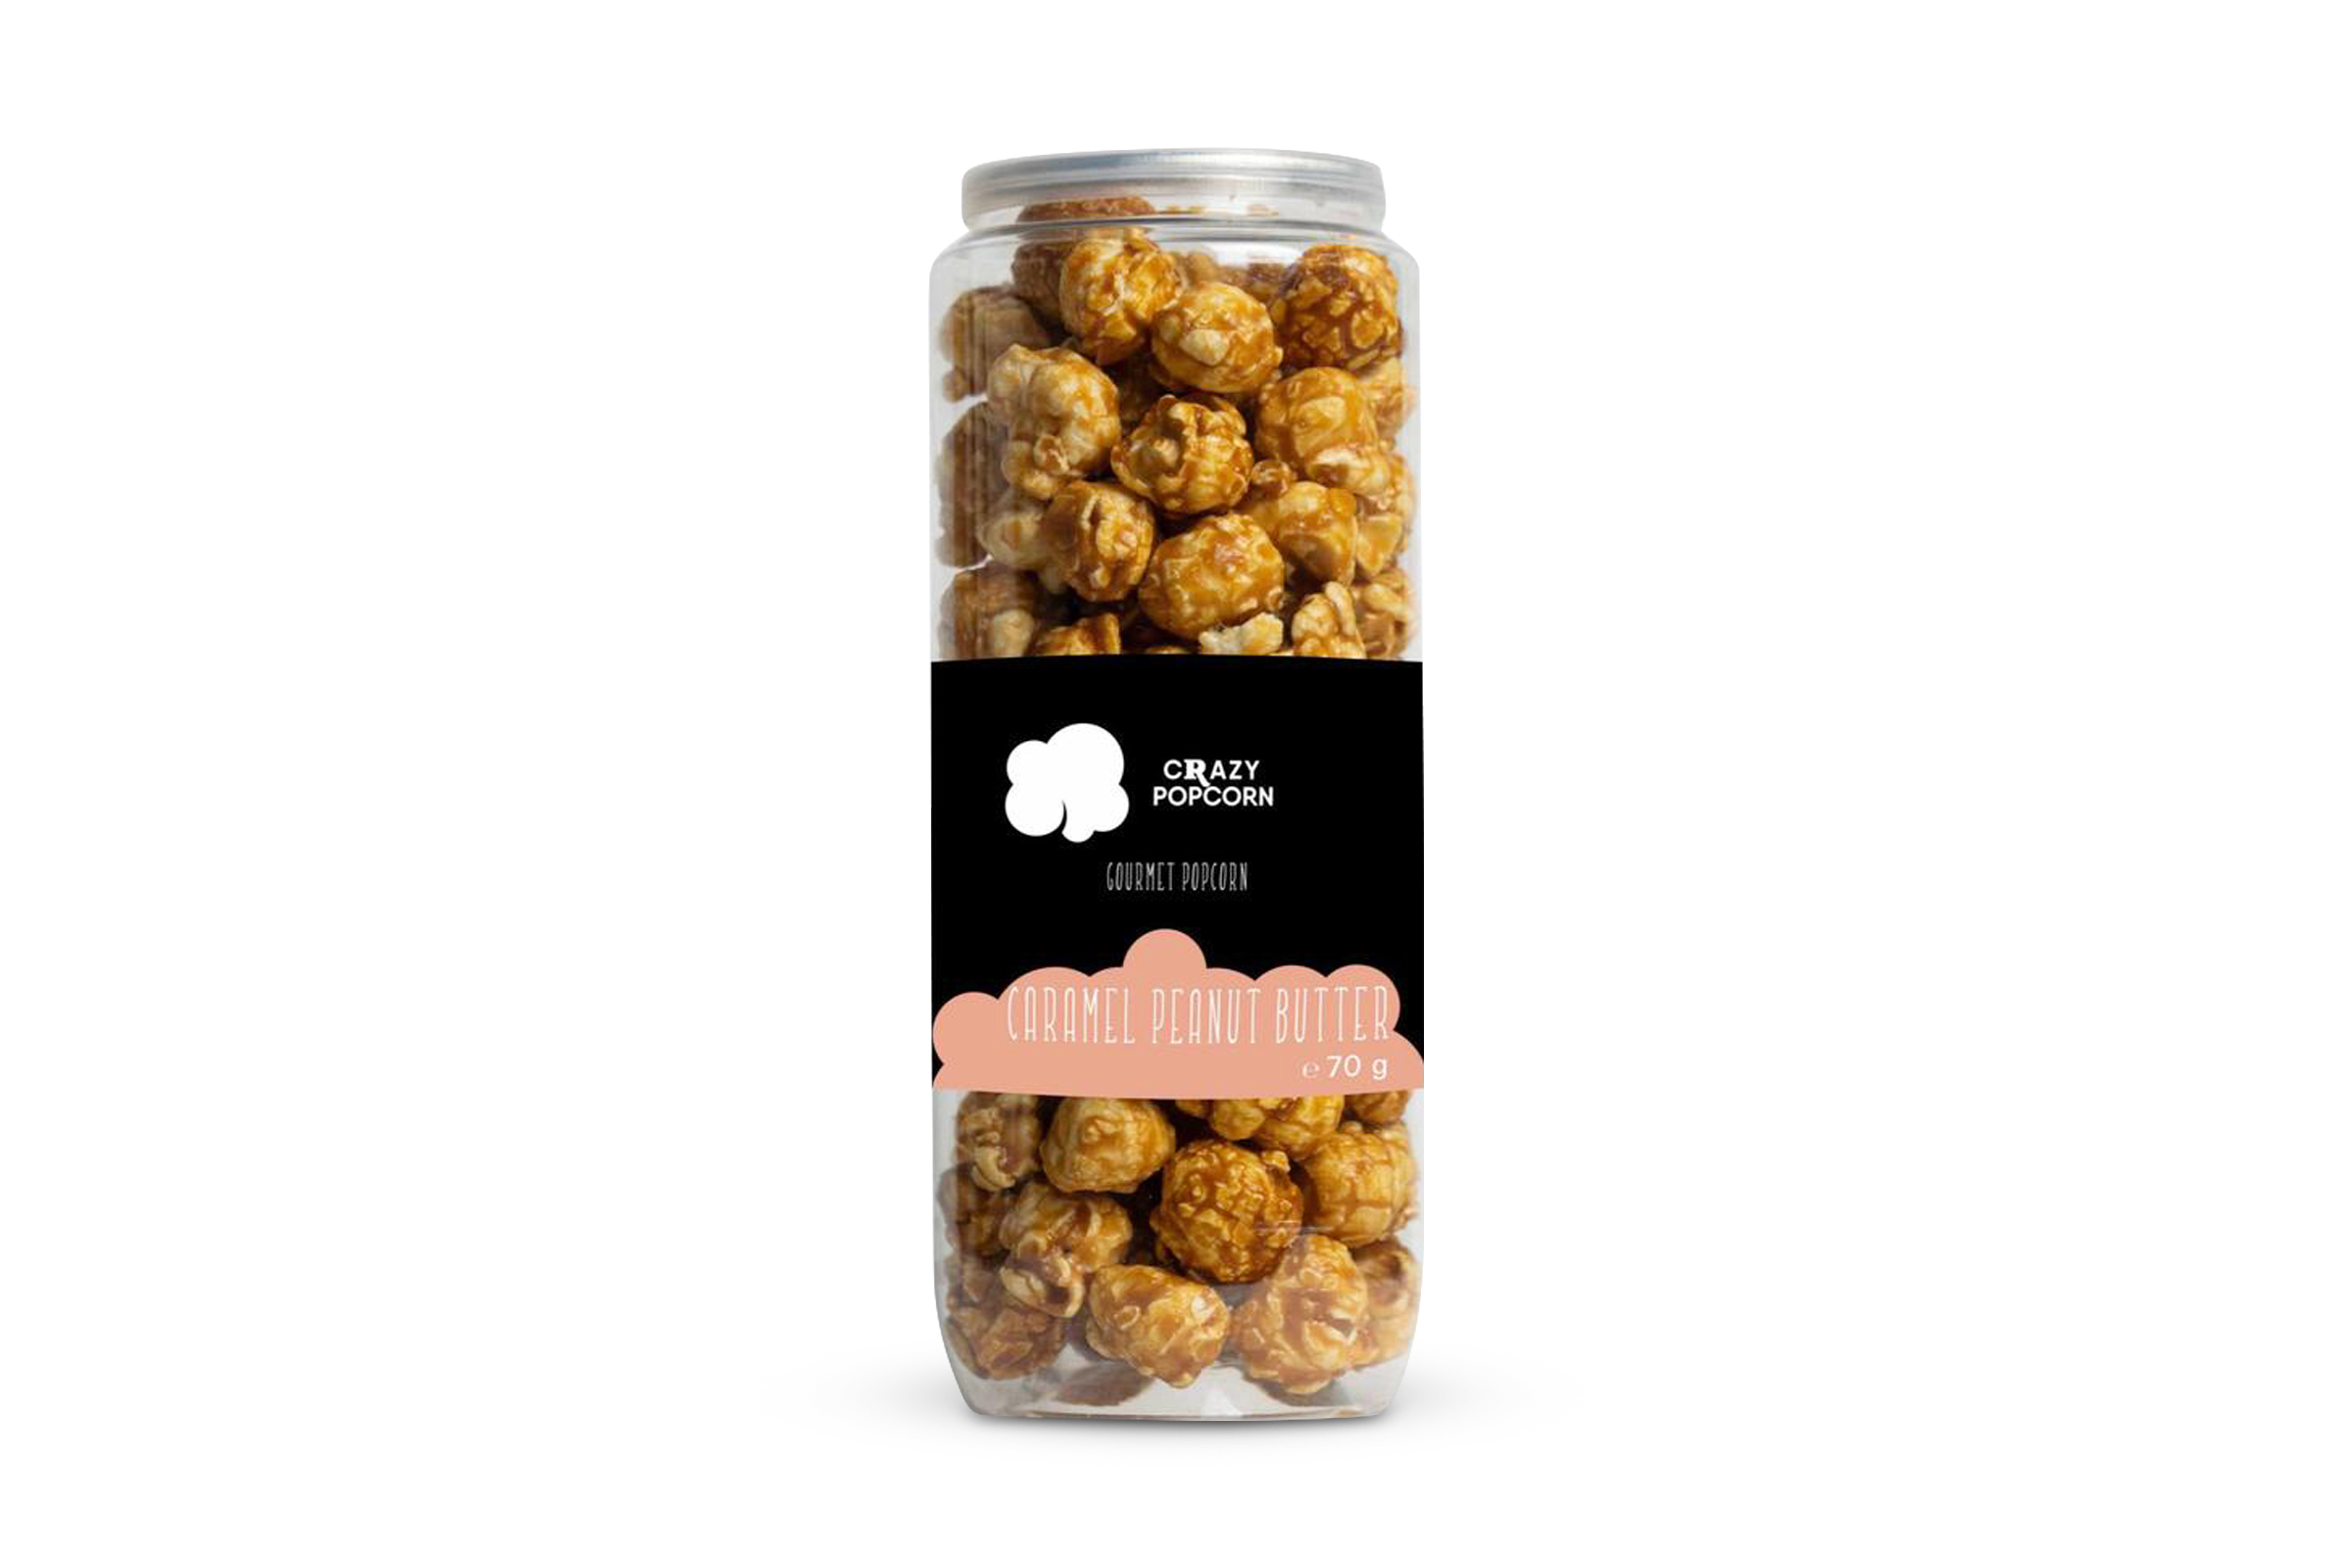 Crazy Popcorn Caramel Peanut Butter 1